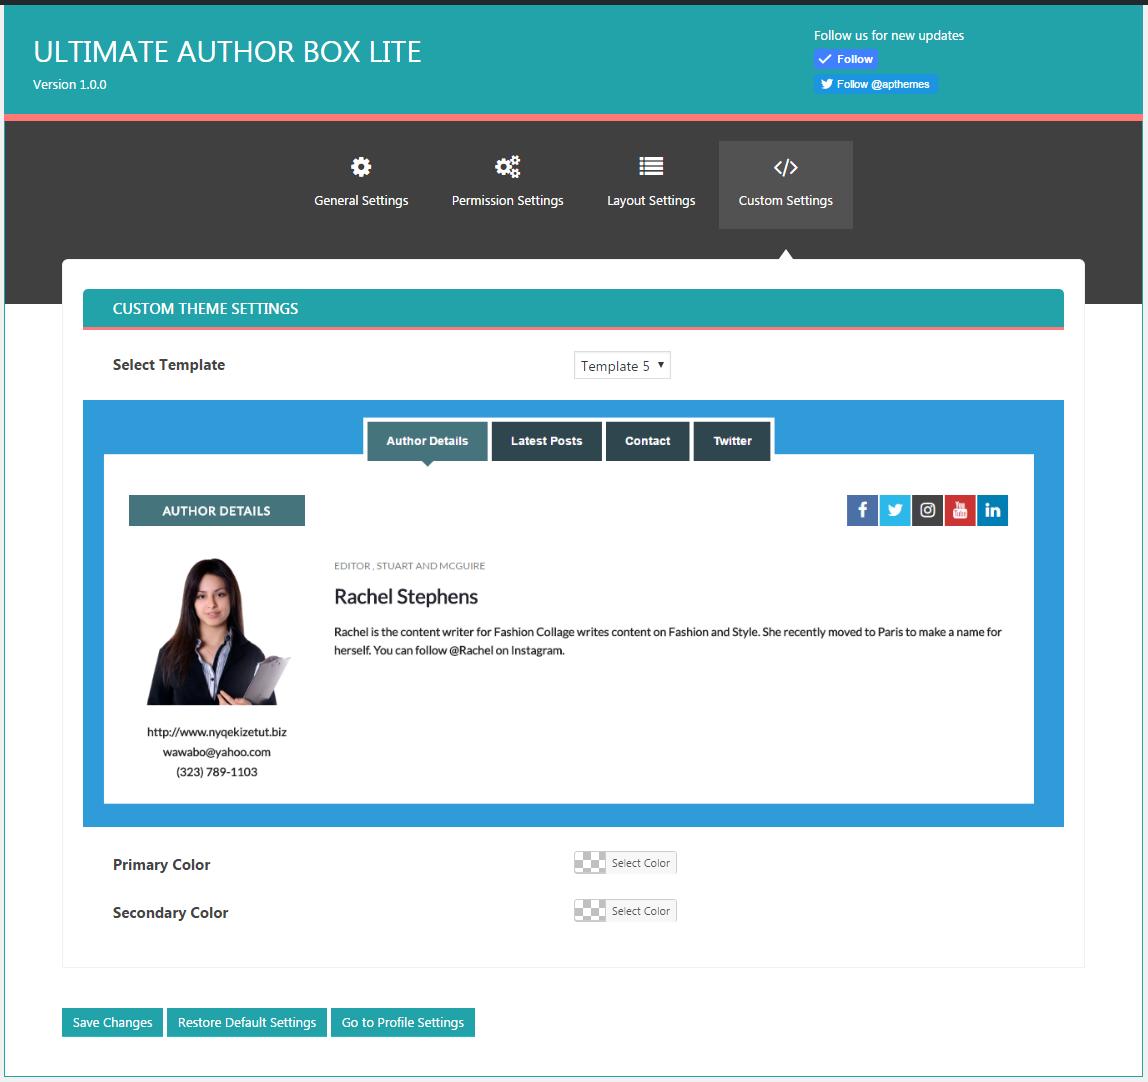 Ultimate Author Box Lite: Custom Settings Tab